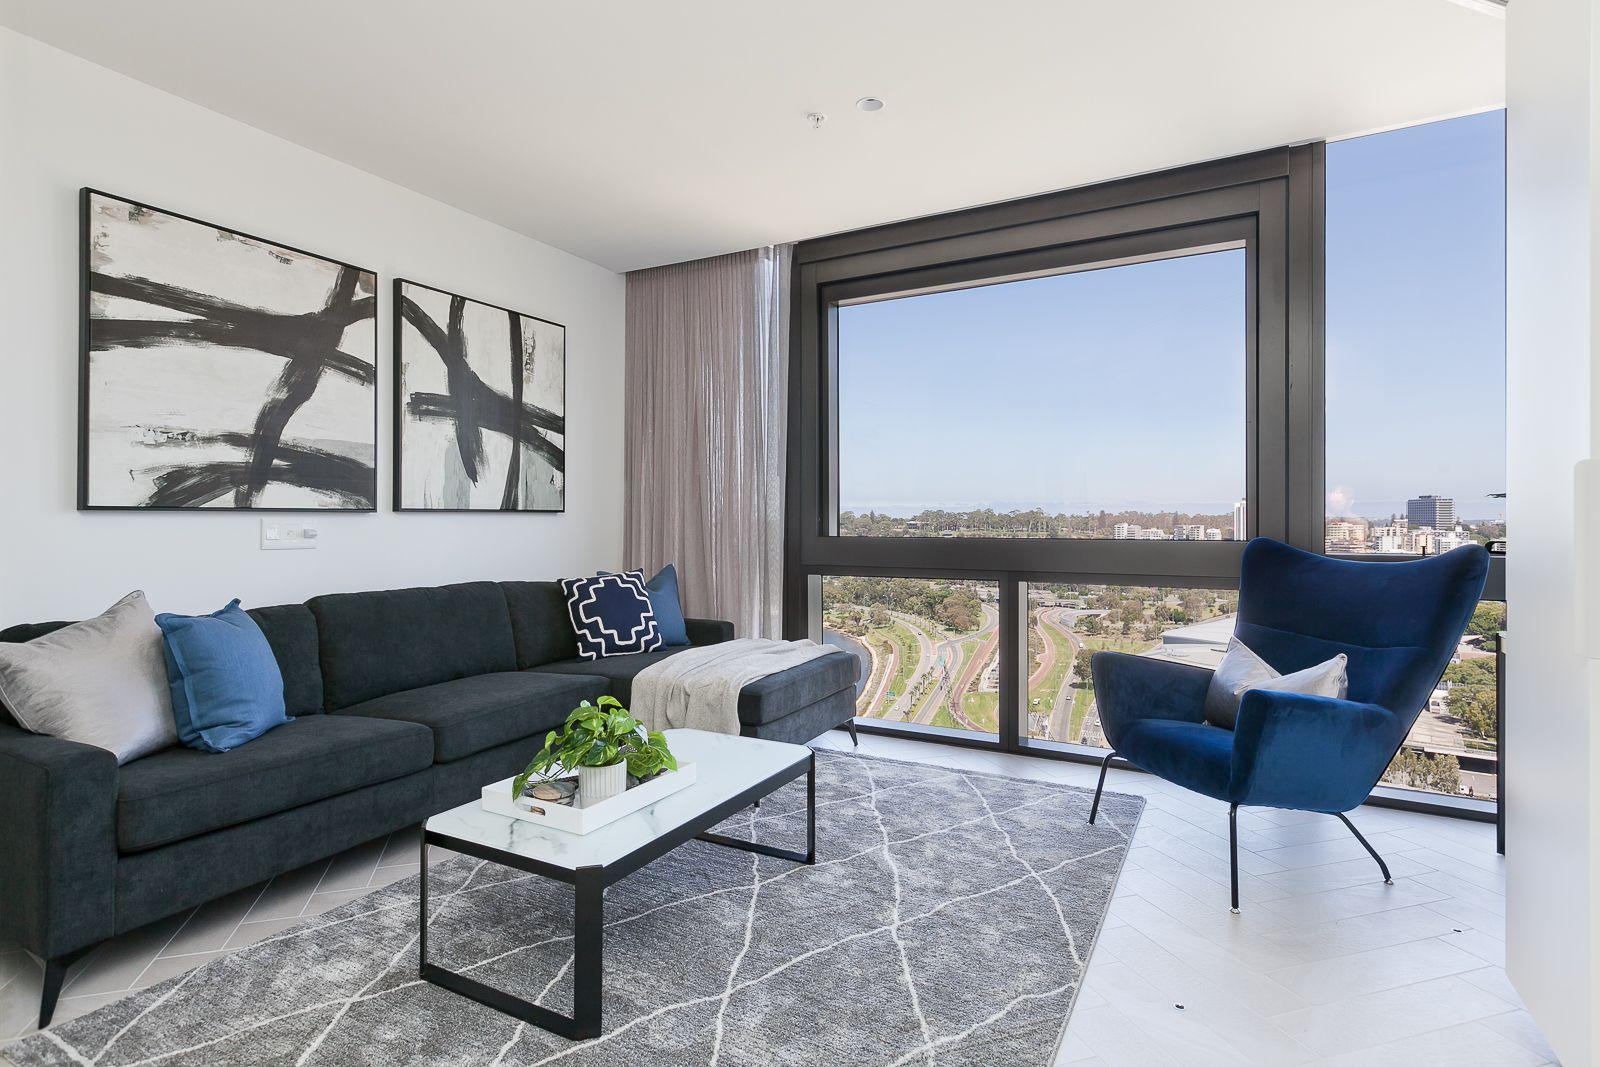 1 bedrooms Apartment / Unit / Flat in 2406/1 Geoffrey Bolton Avenue PERTH WA, 6000